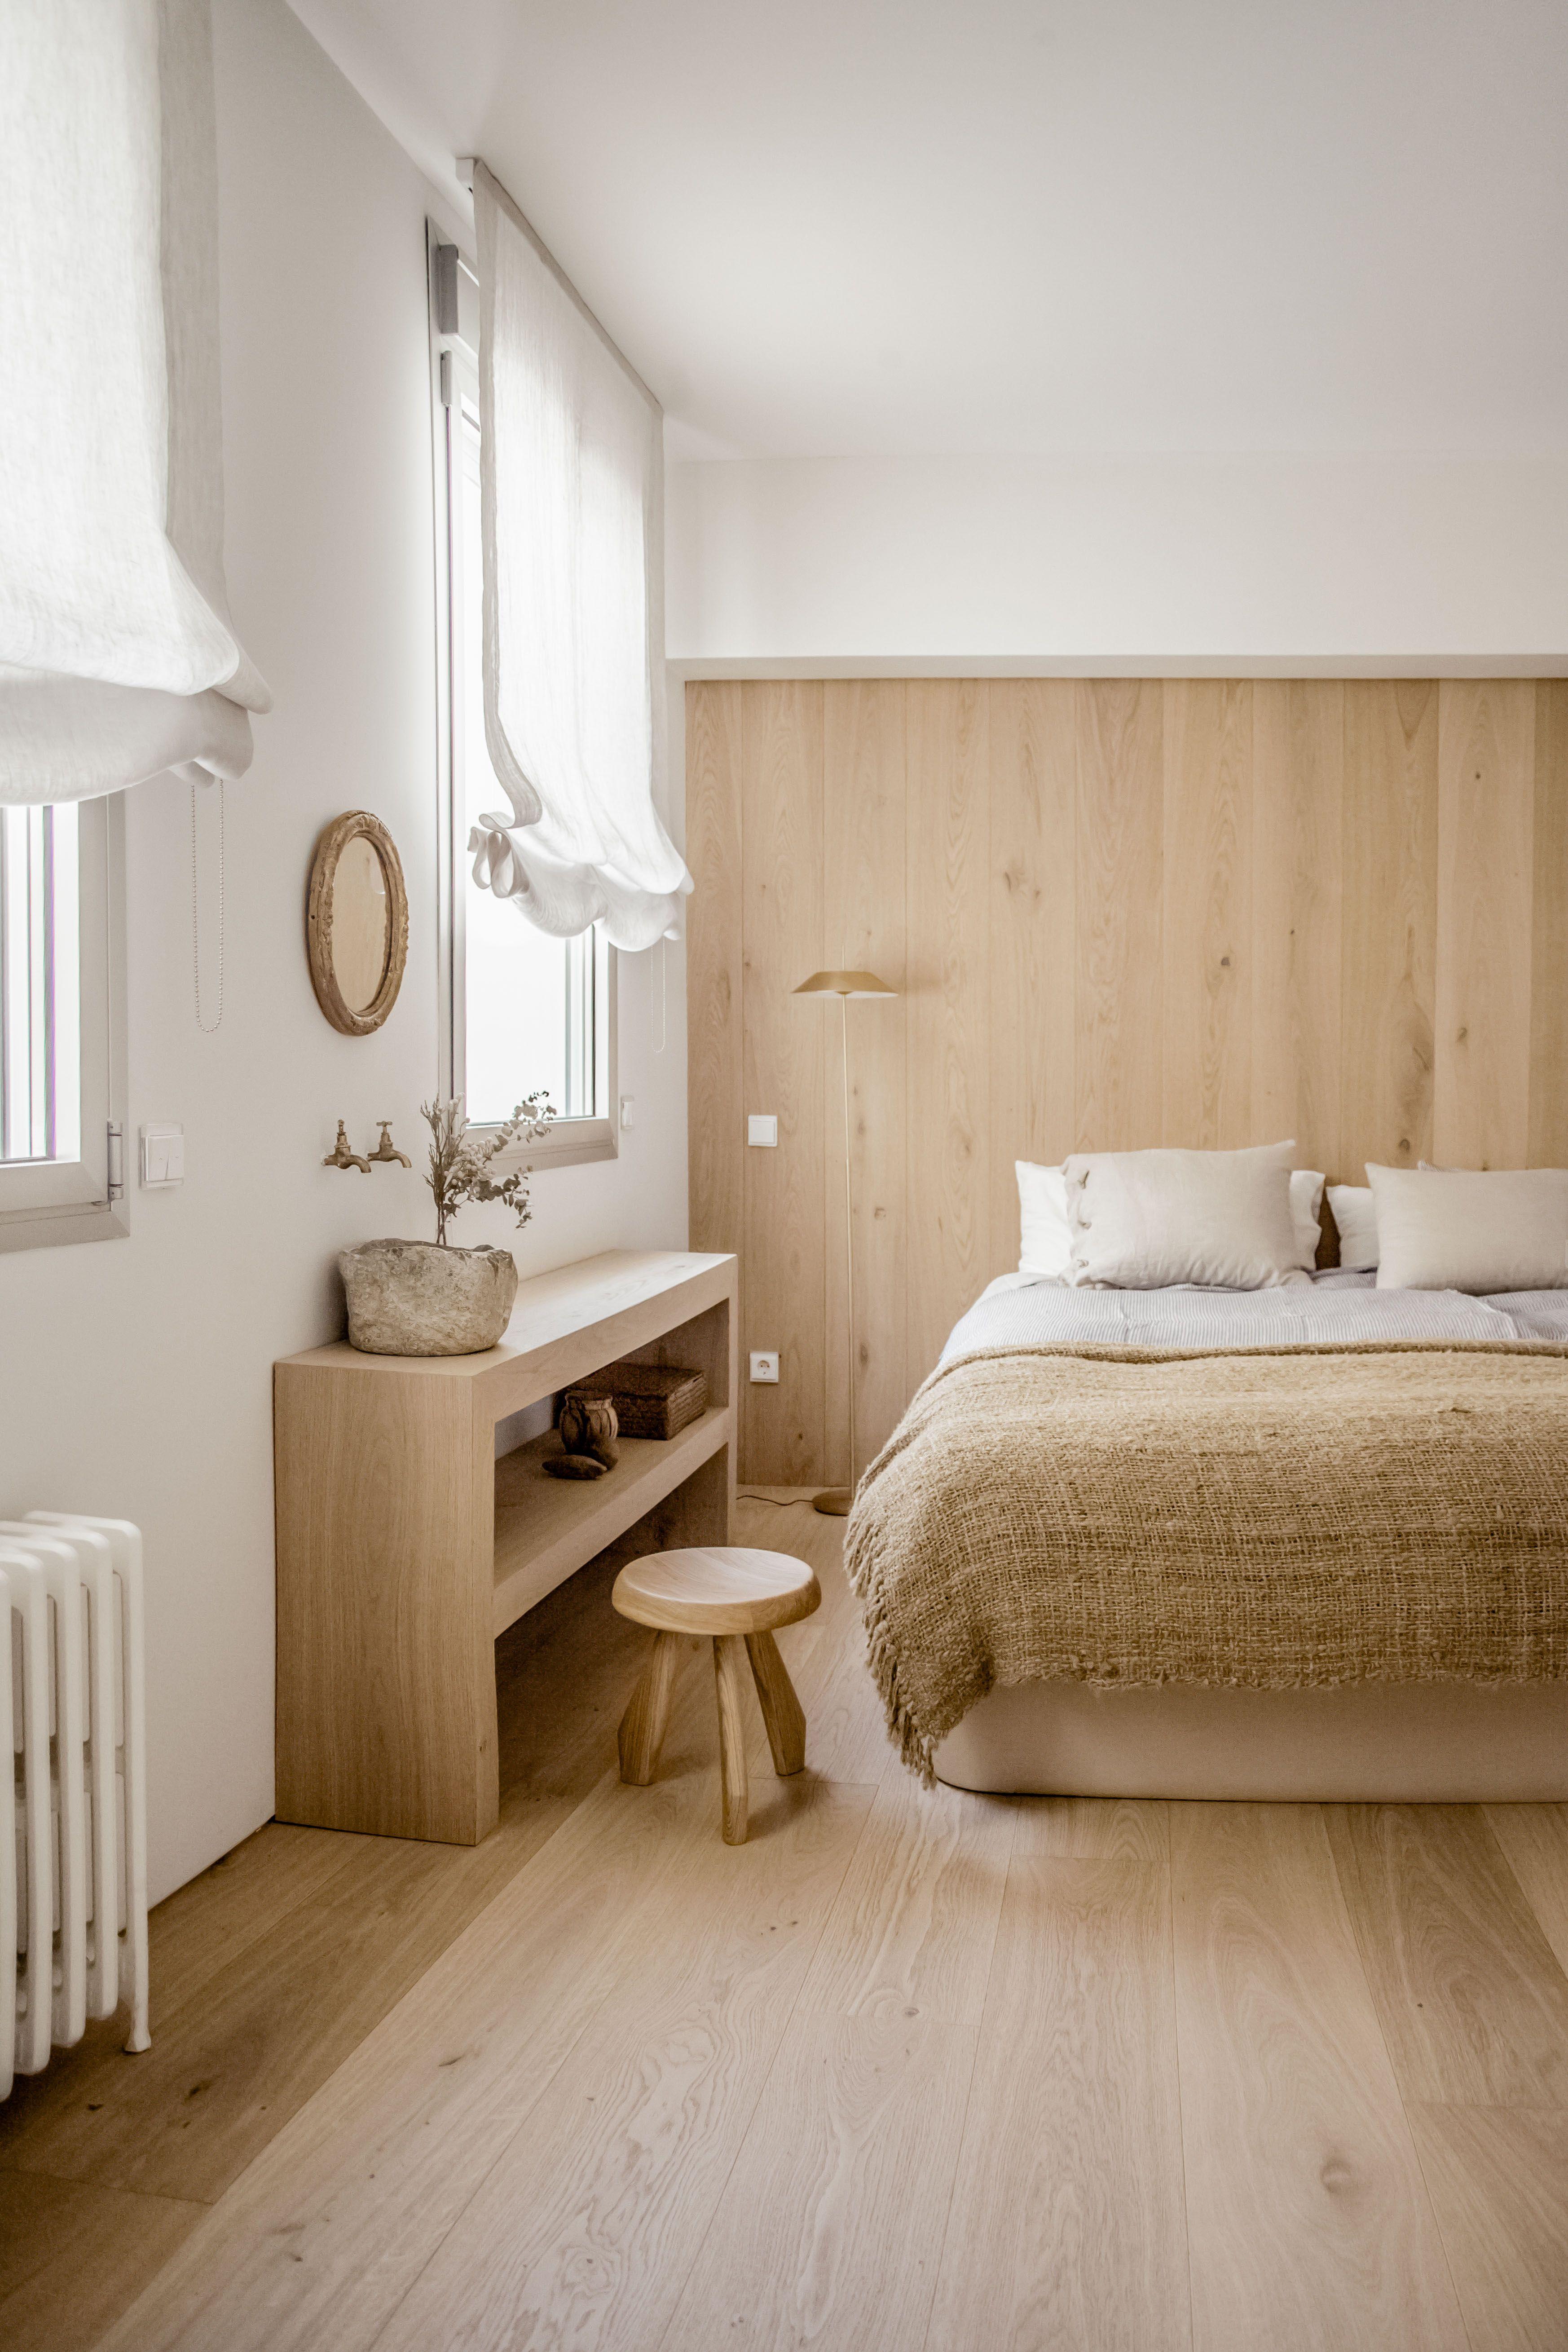 Oak walls and floor. Bed. Custommade wooden dressing